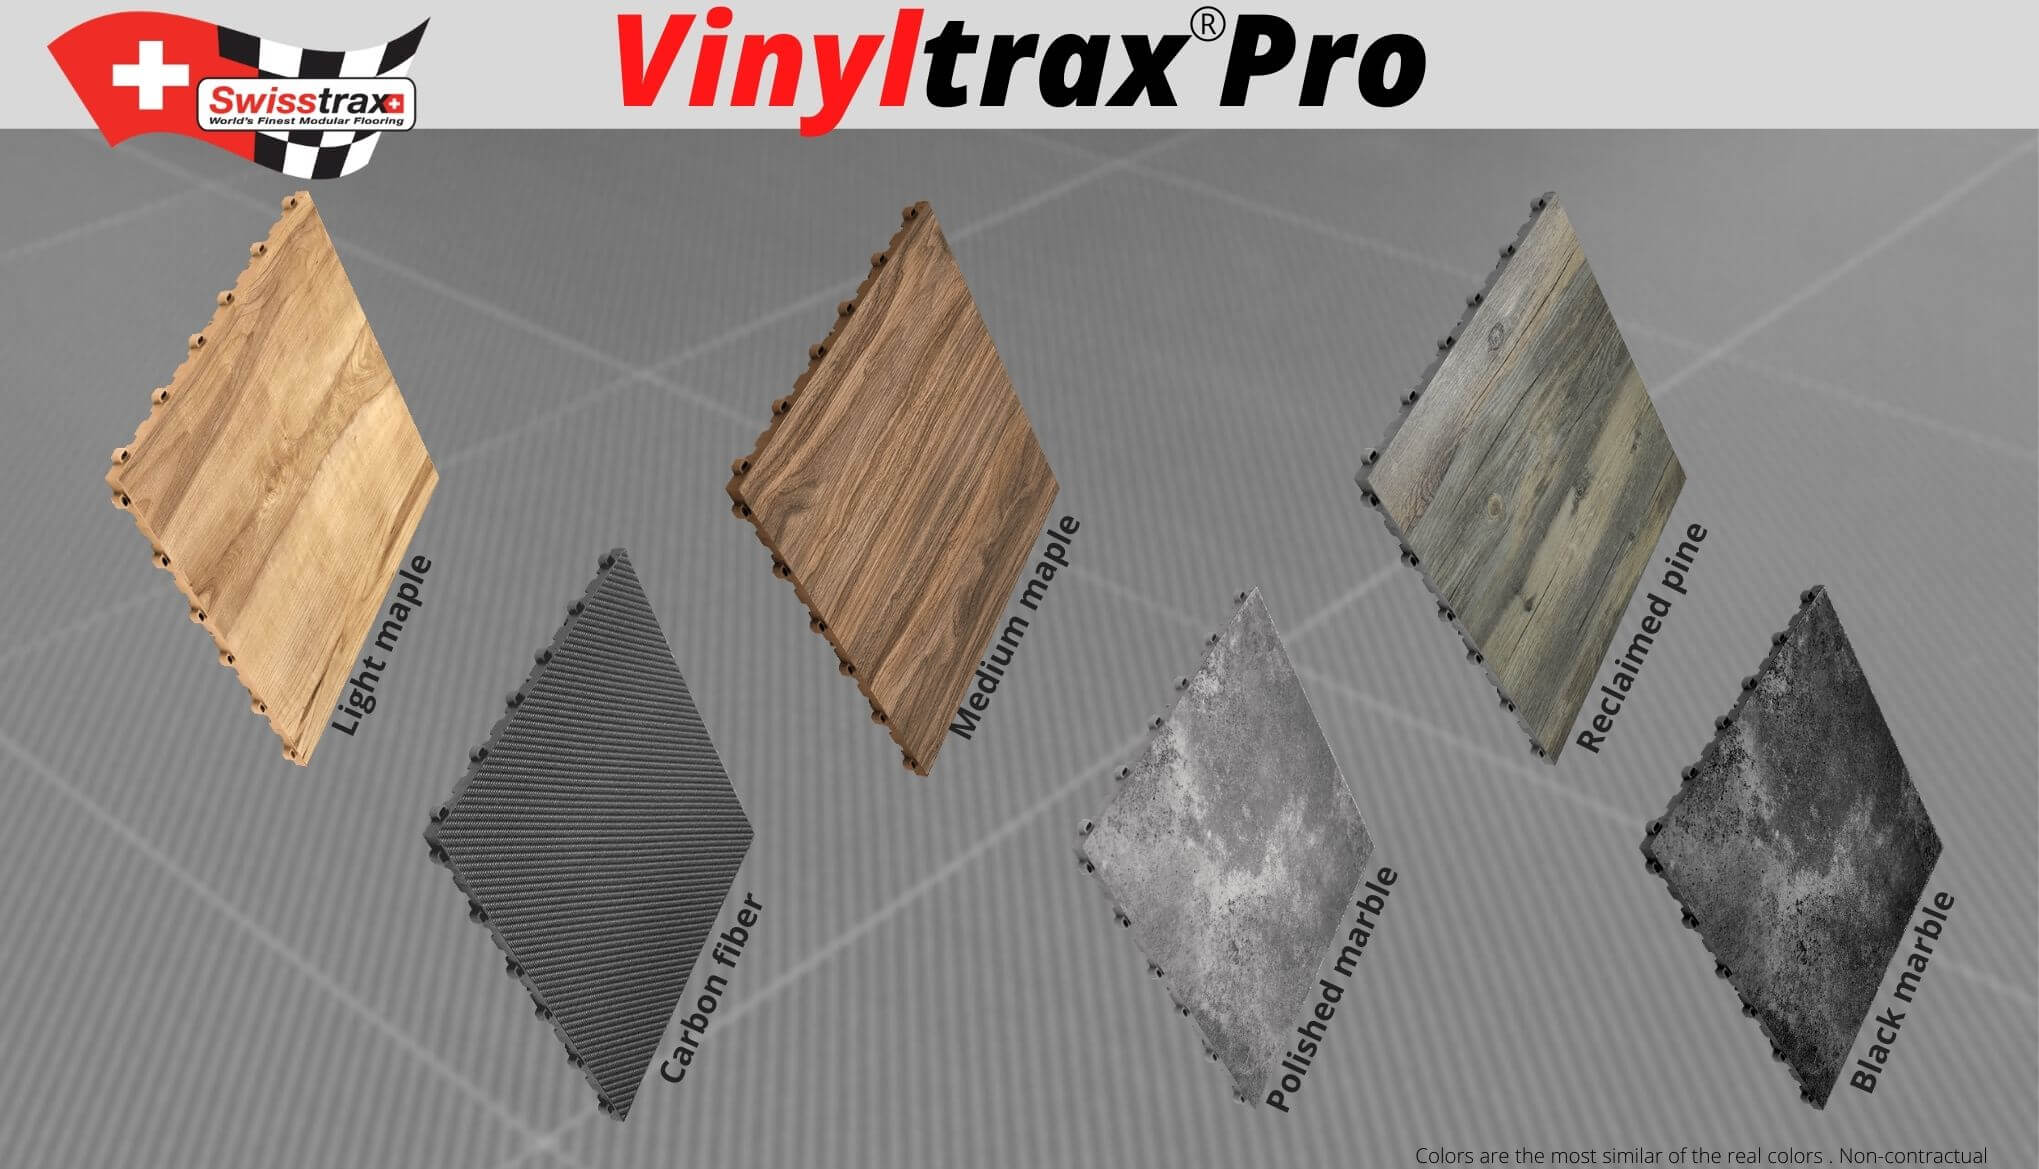 vinyltrax pro colors